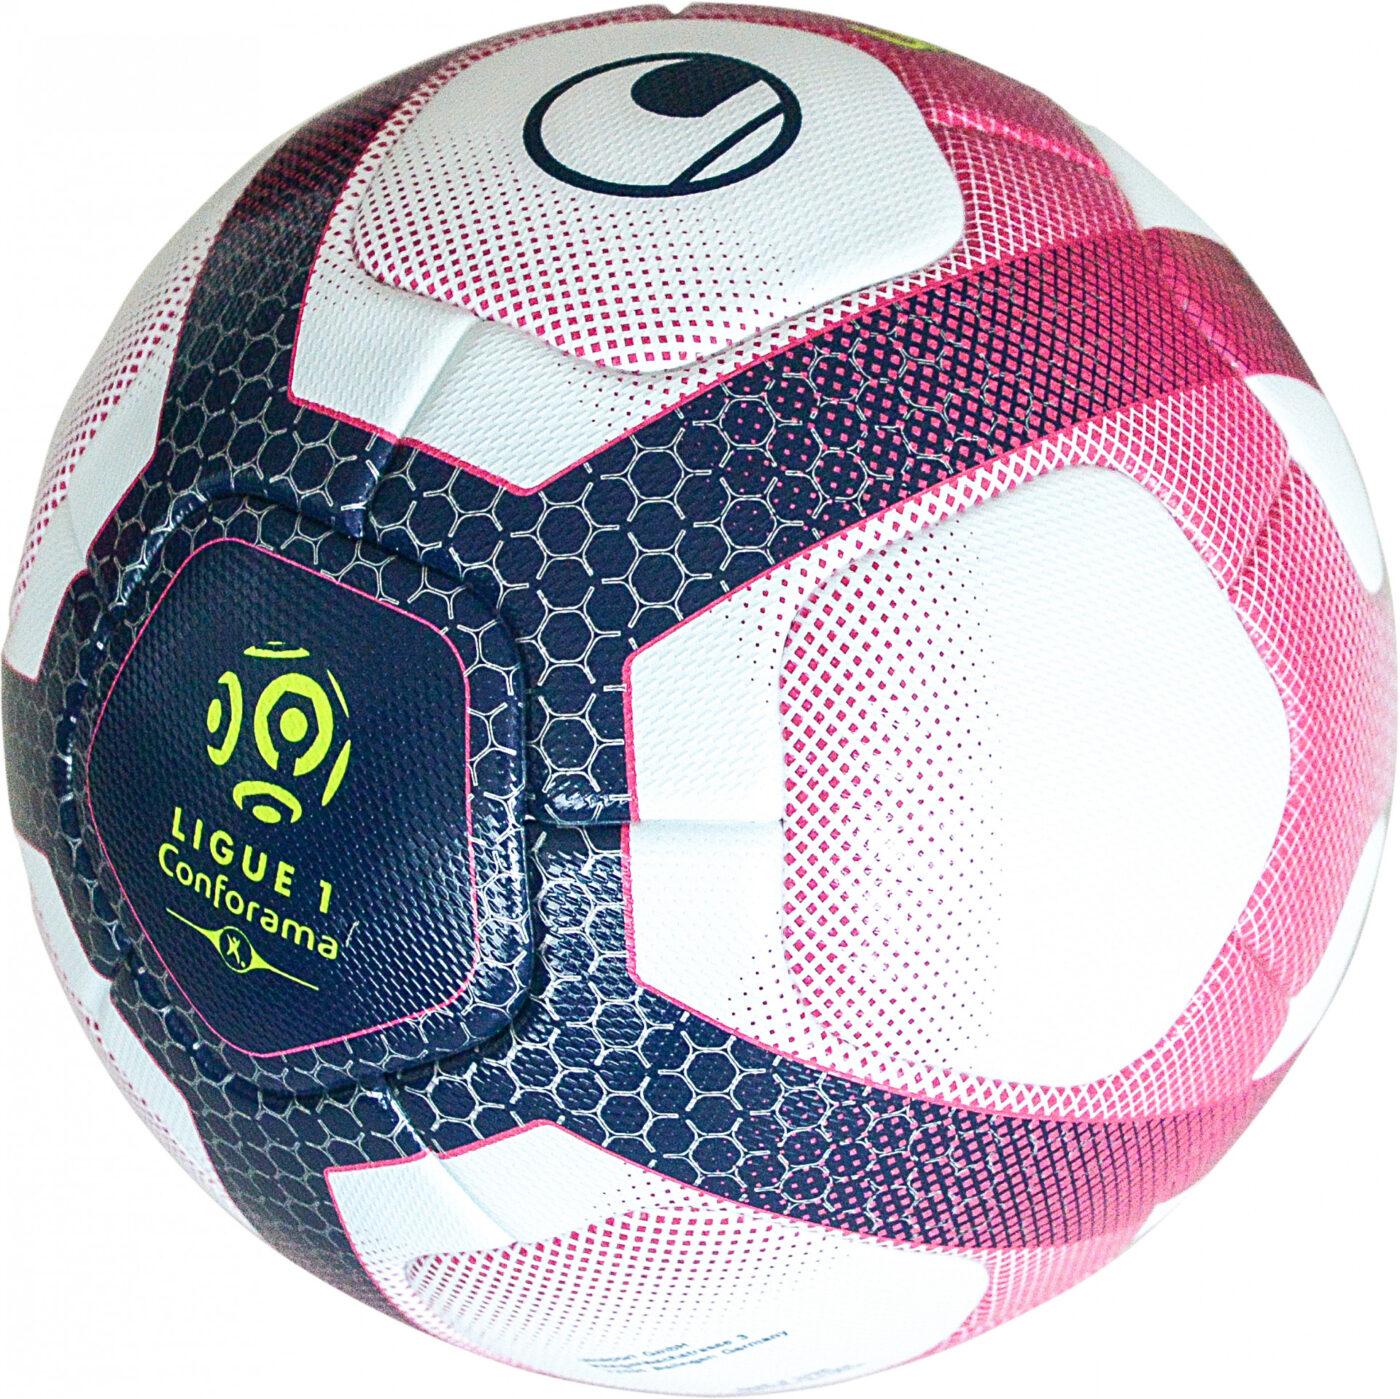 Ballon uhlsport Ligue 1 2018-2019